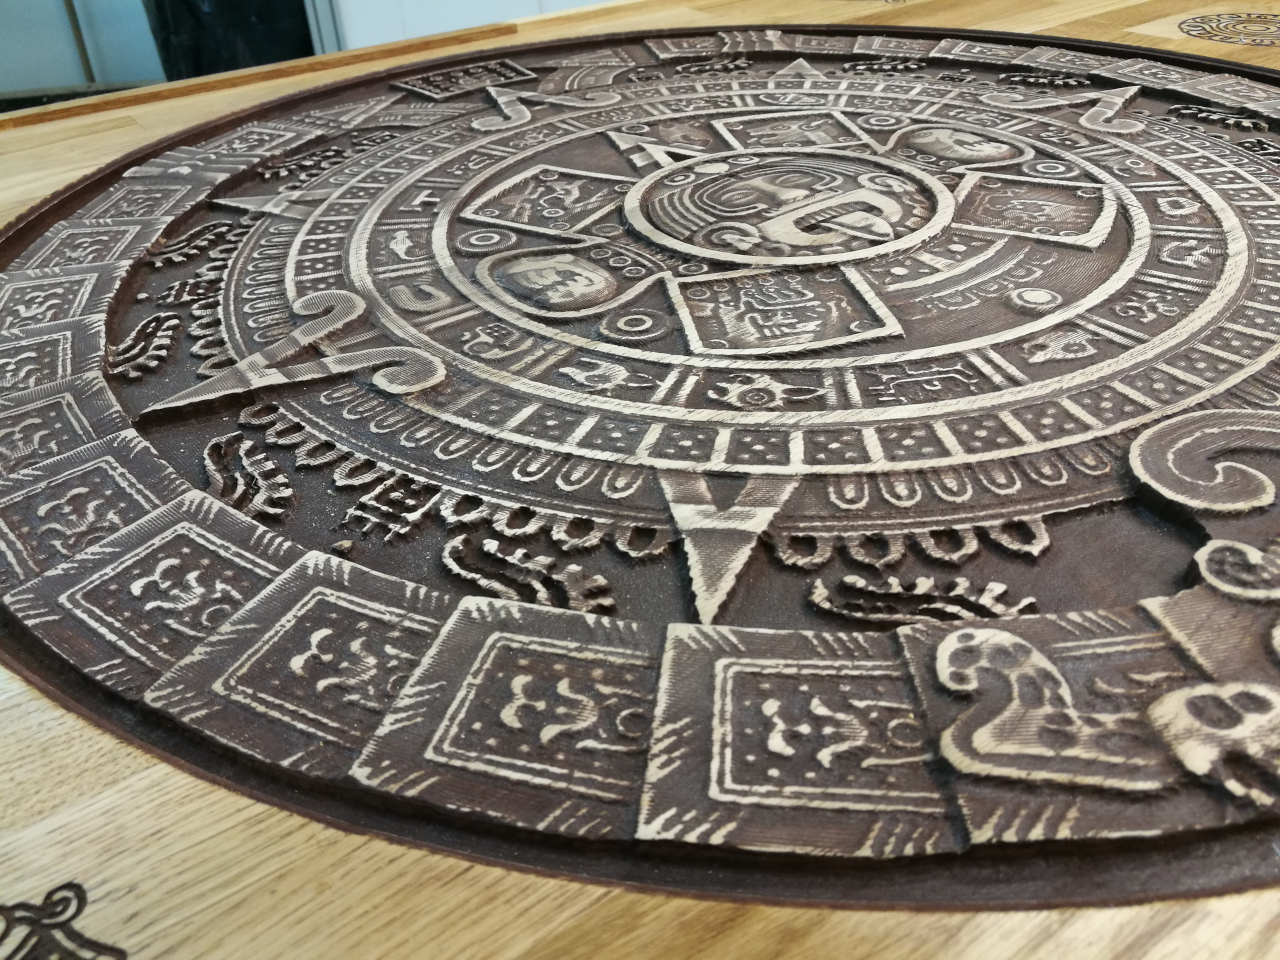 Calendrier Maya Dessin.Table Basse Calendrier Maya 3d Atelier Federico